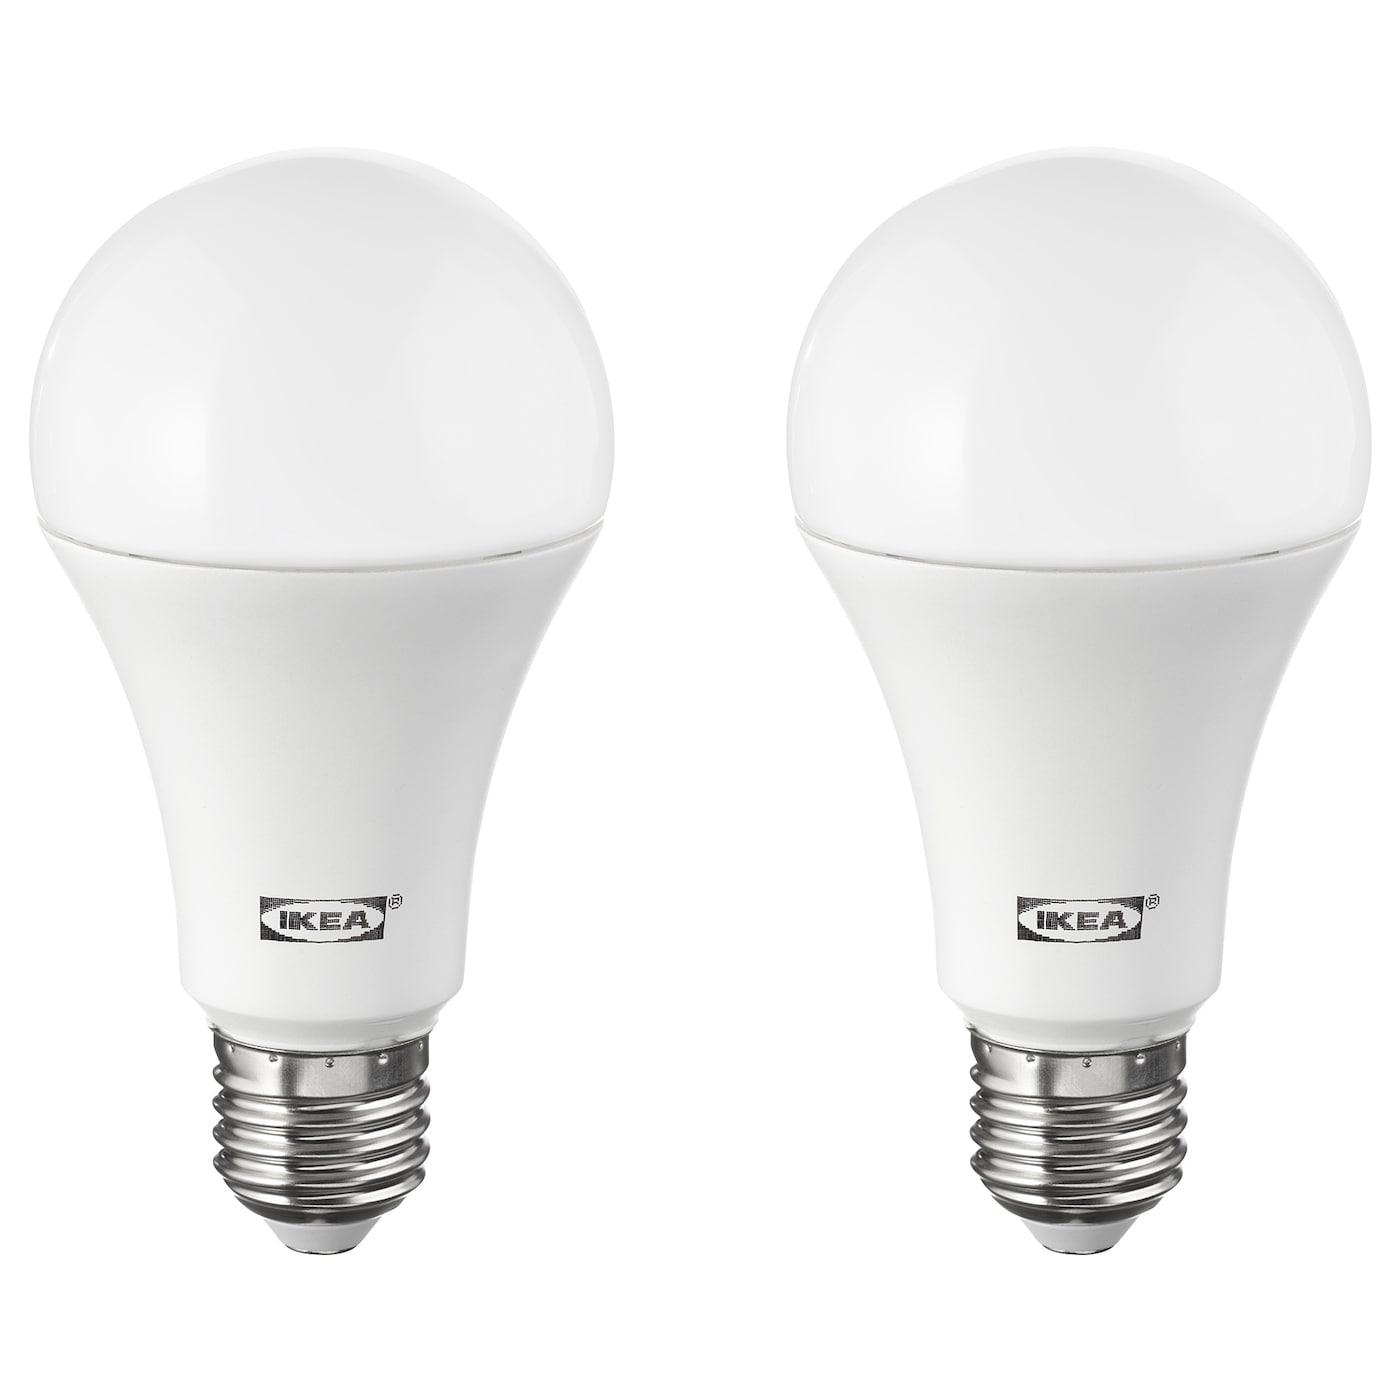 Ikea Ryet Led Bulb E27 1600 Lumen